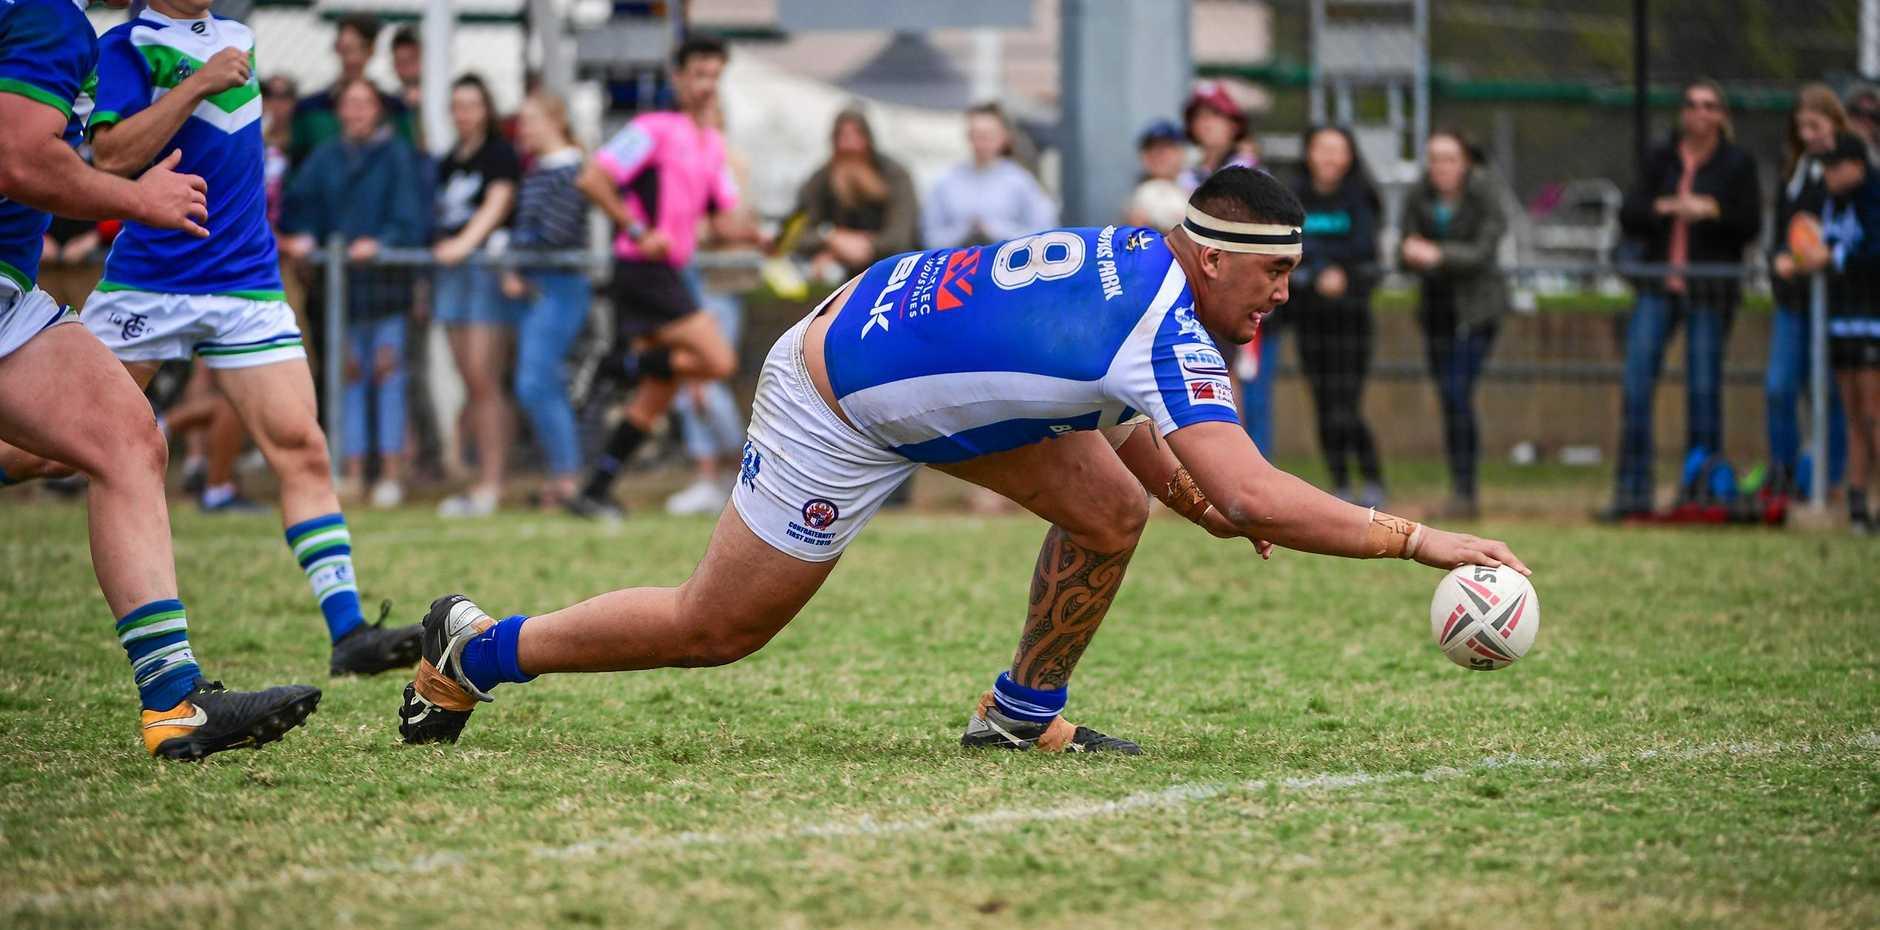 Kaelin KereKere scores - Ignatius Park College, Townsville